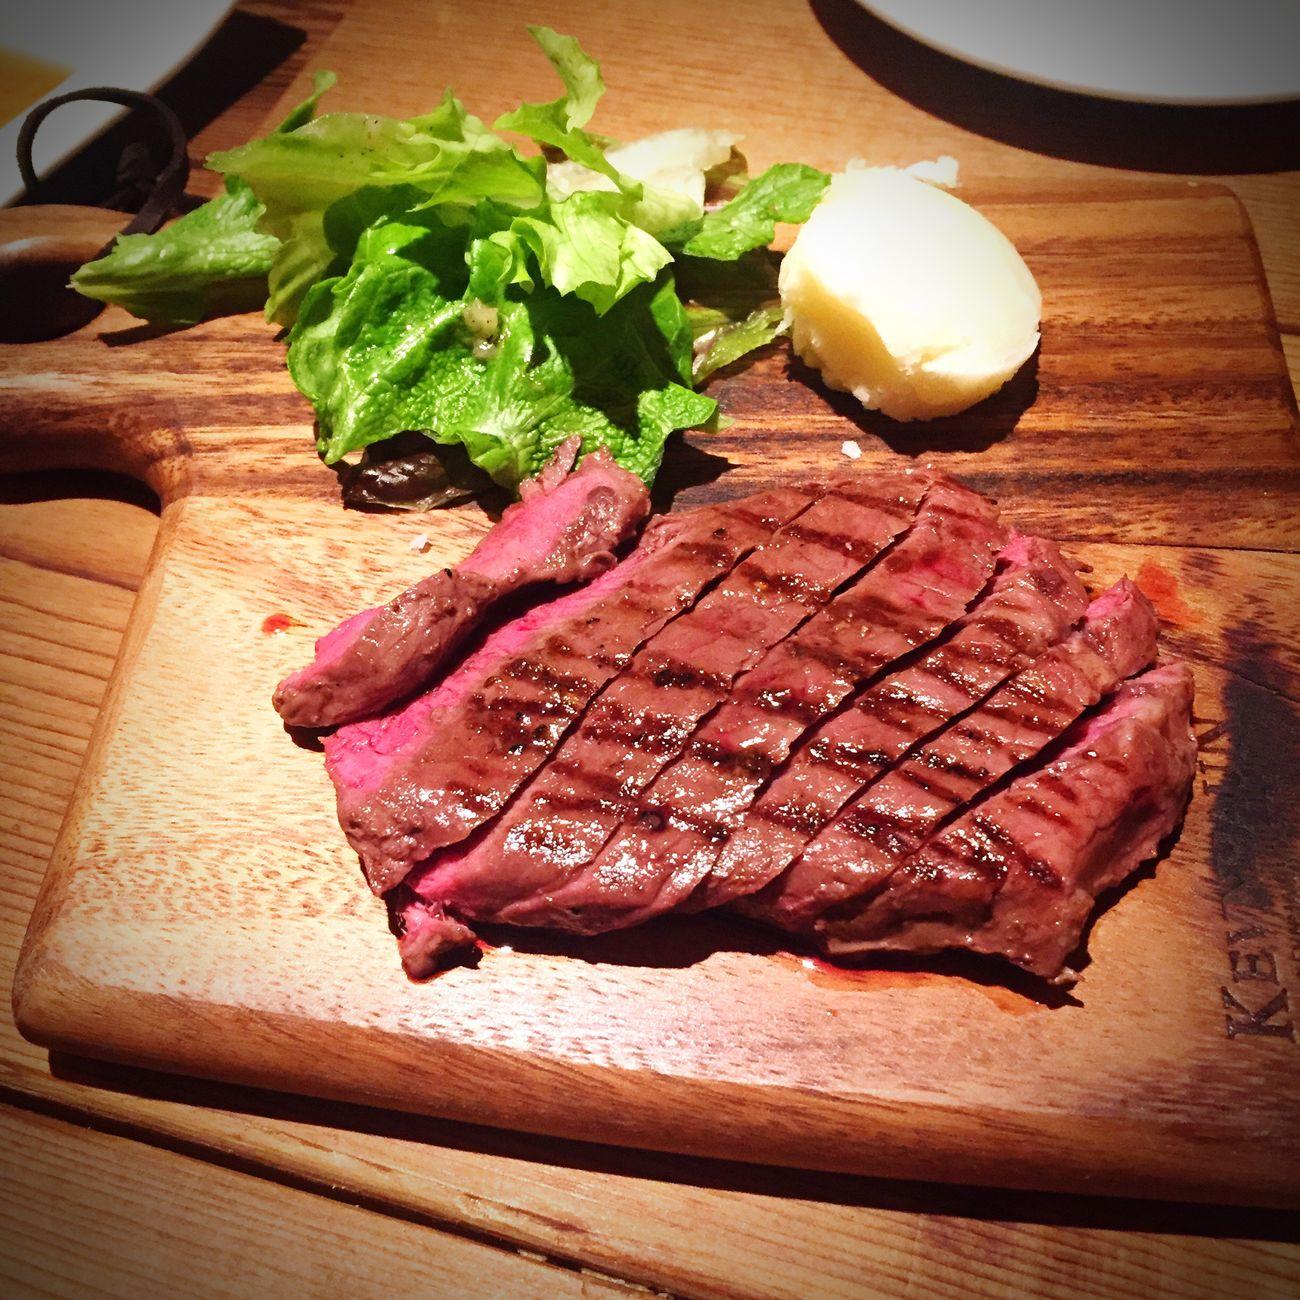 Meat Beef Meetgood 香里園 肉バル ランプ ステーキ Wine